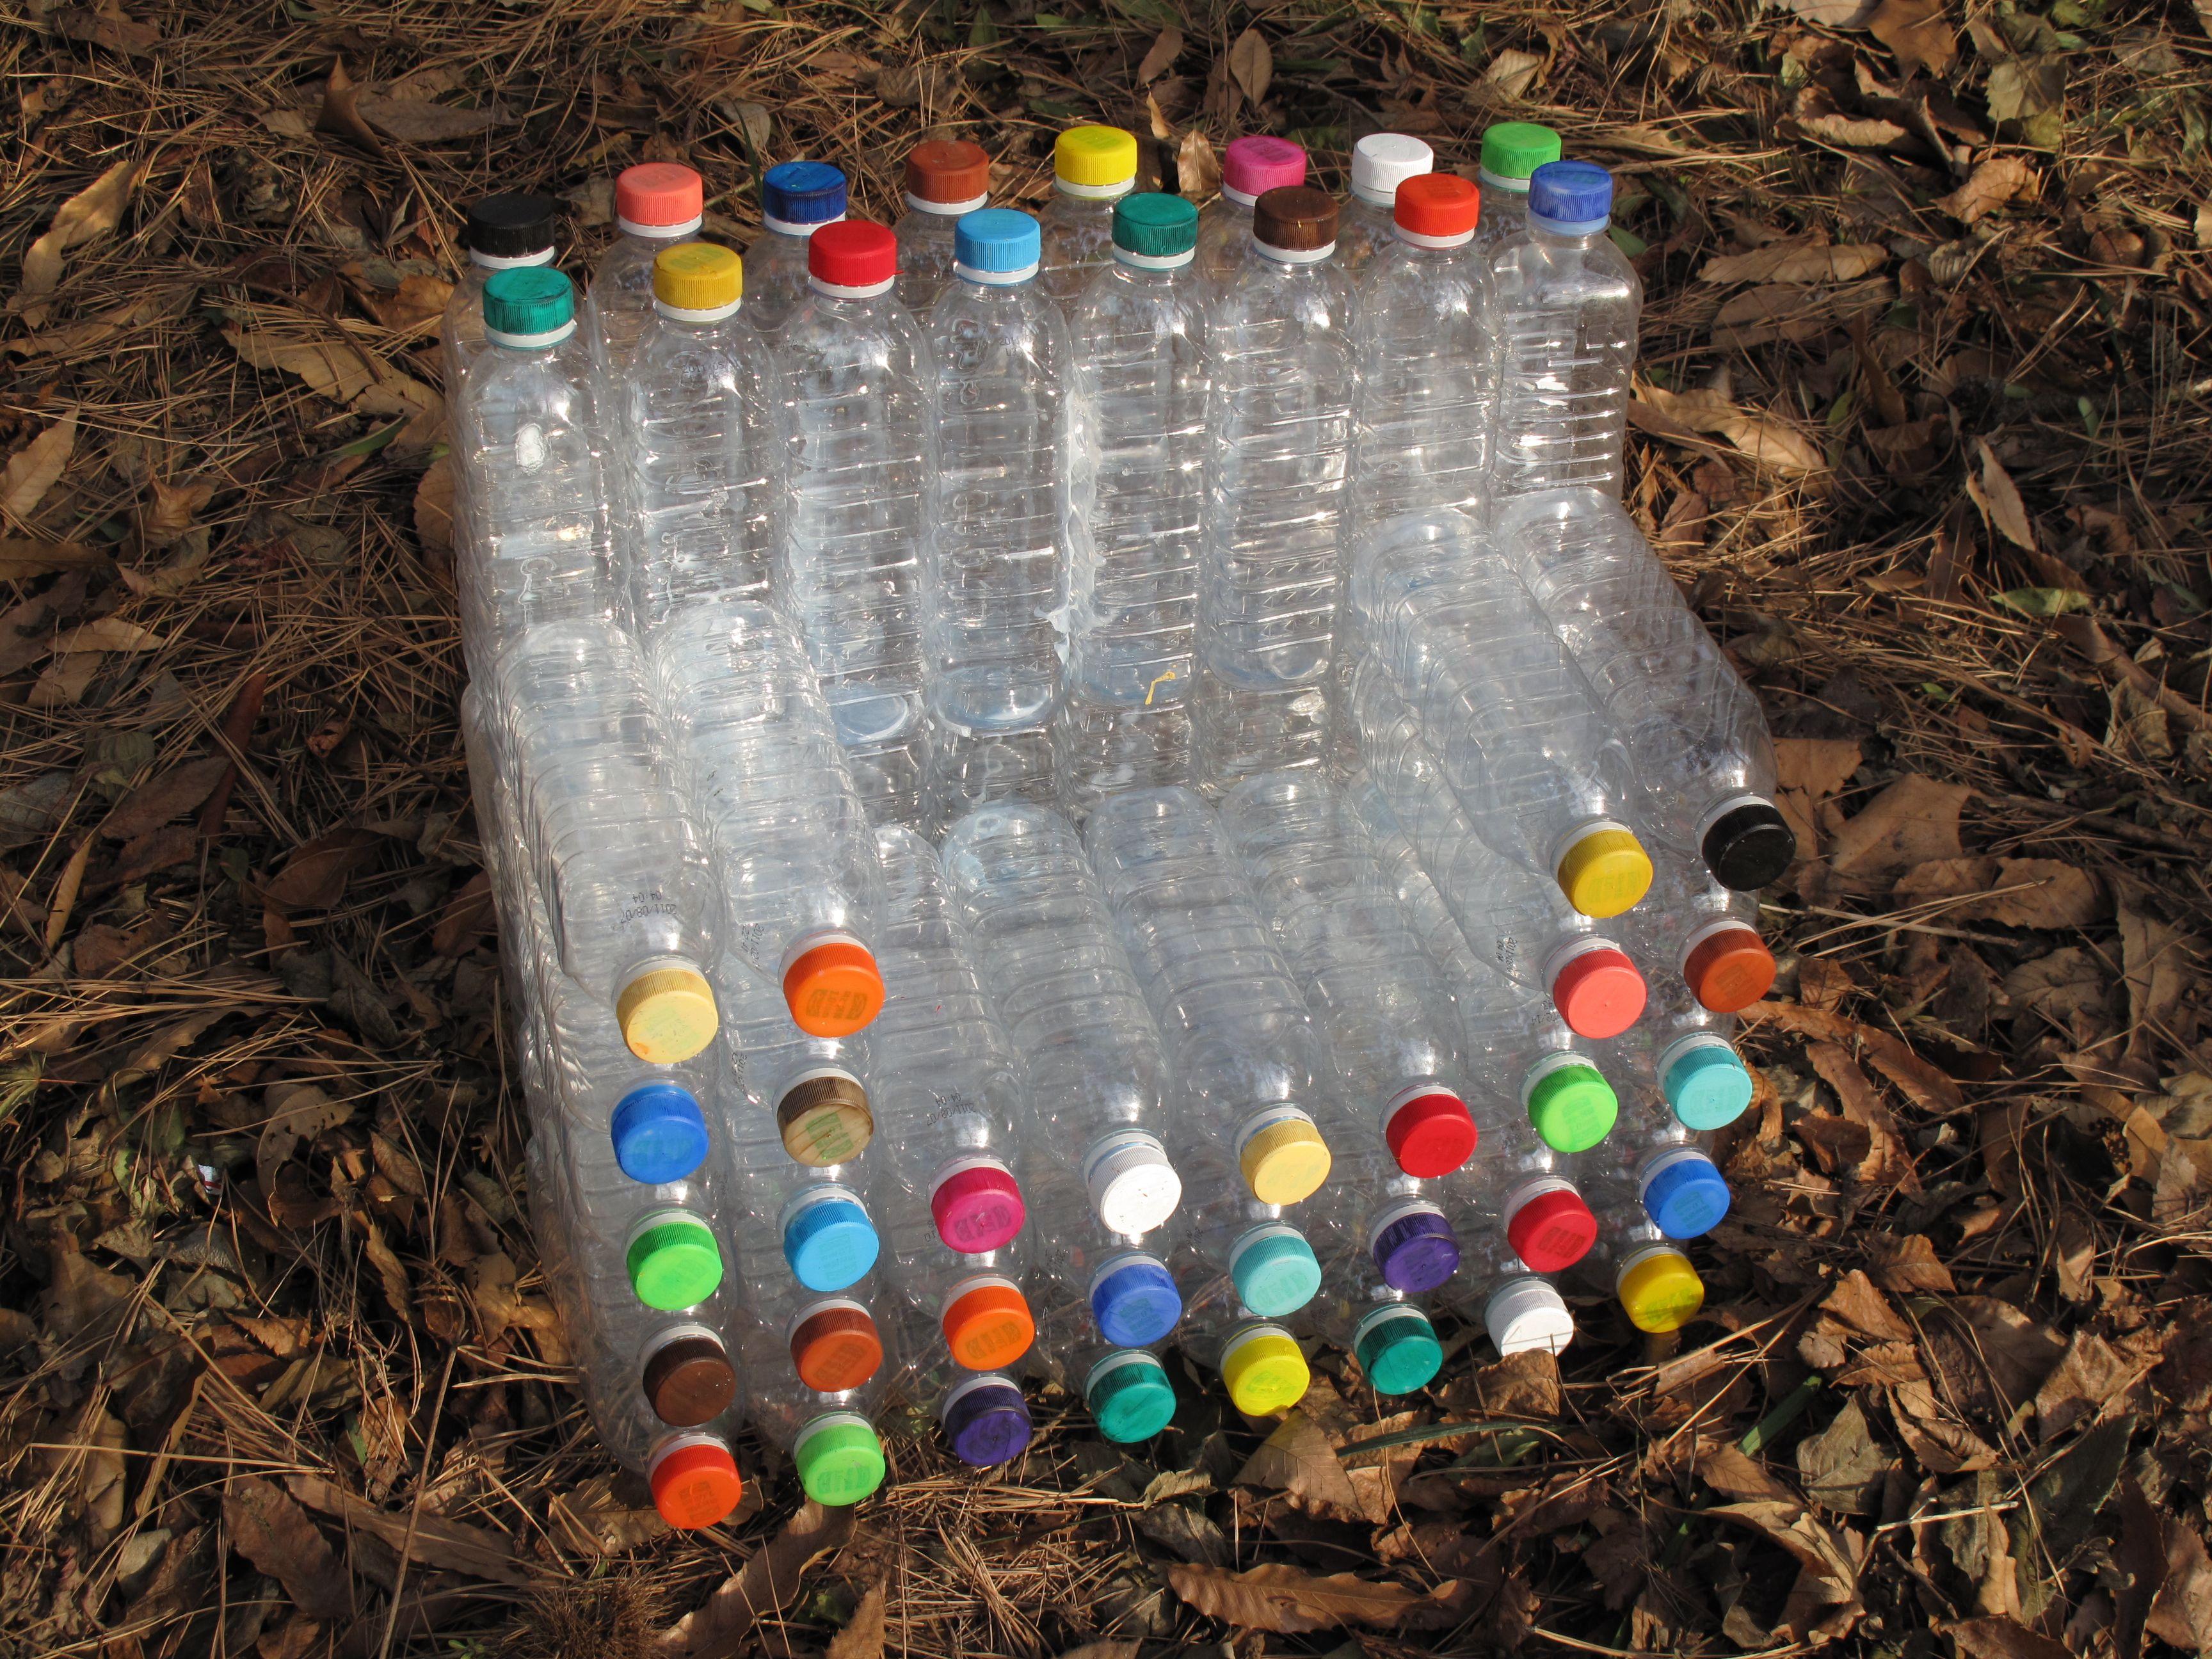 Plastic Bottle Recycling 56 Inspirations Of Art From Recycled Plastic Bottles Guru Koala